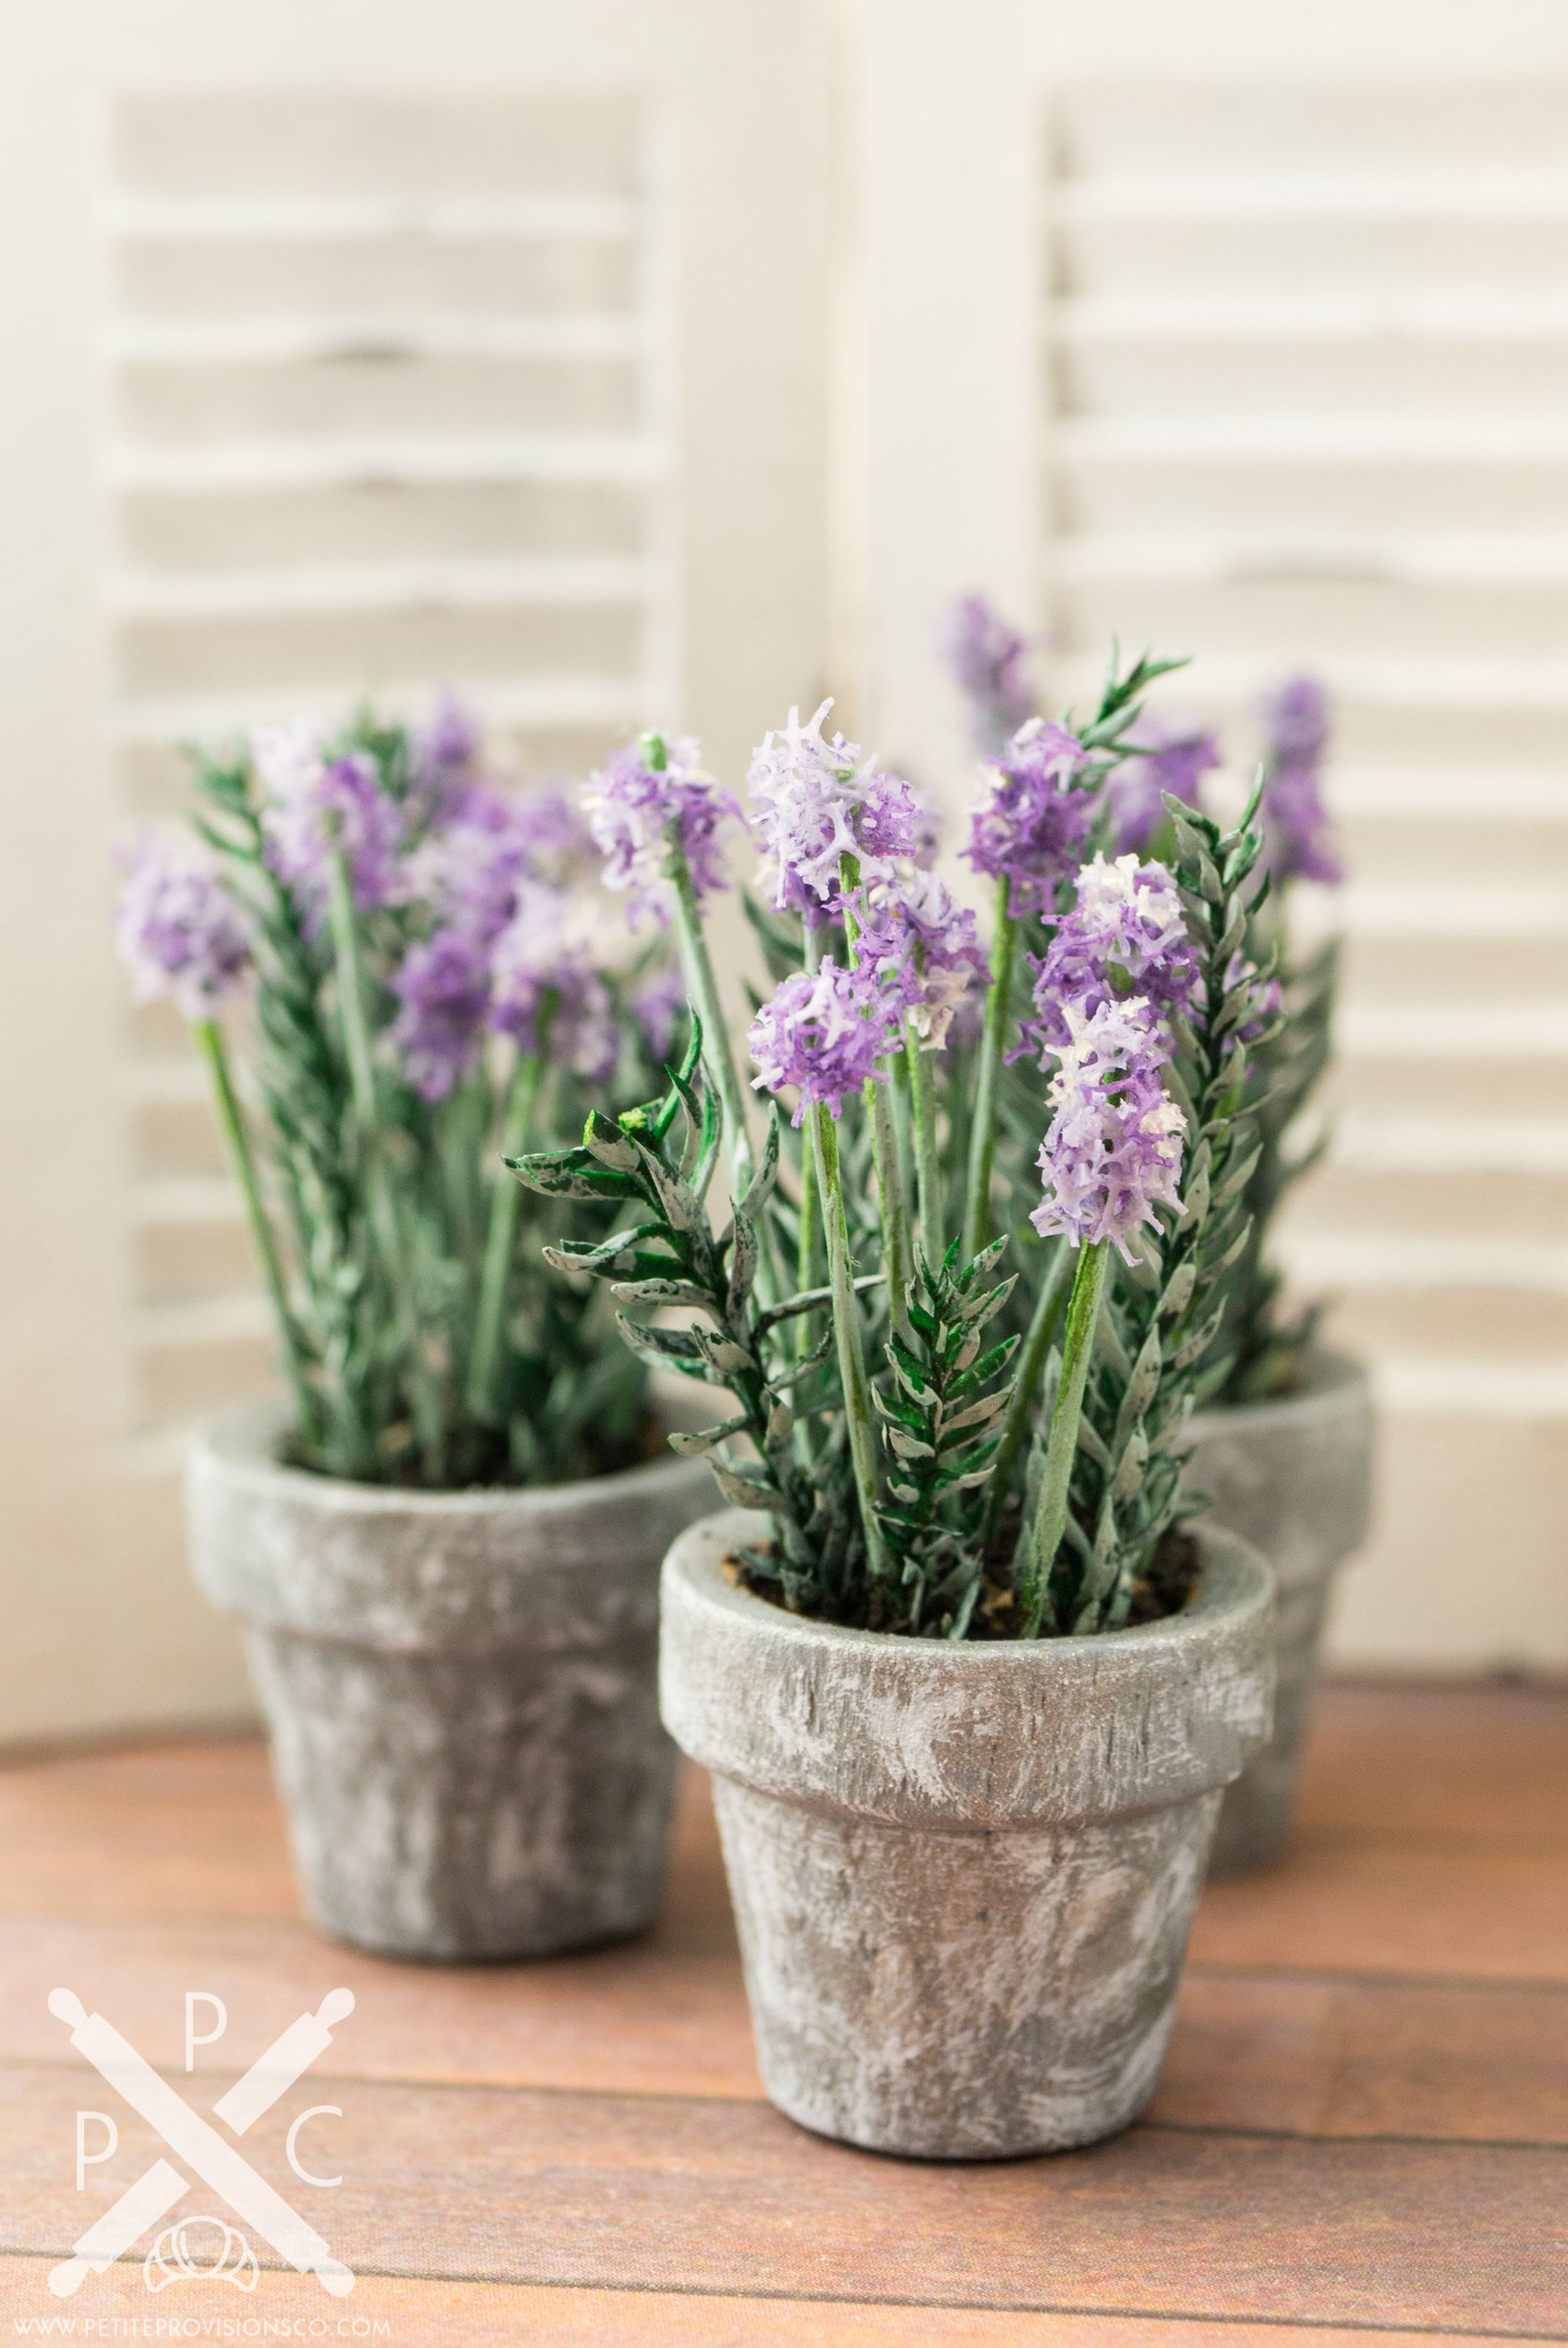 Purple Hydrangea Flower Dollhouse Miniature Clay Handmade Plant Pot Garden Decor